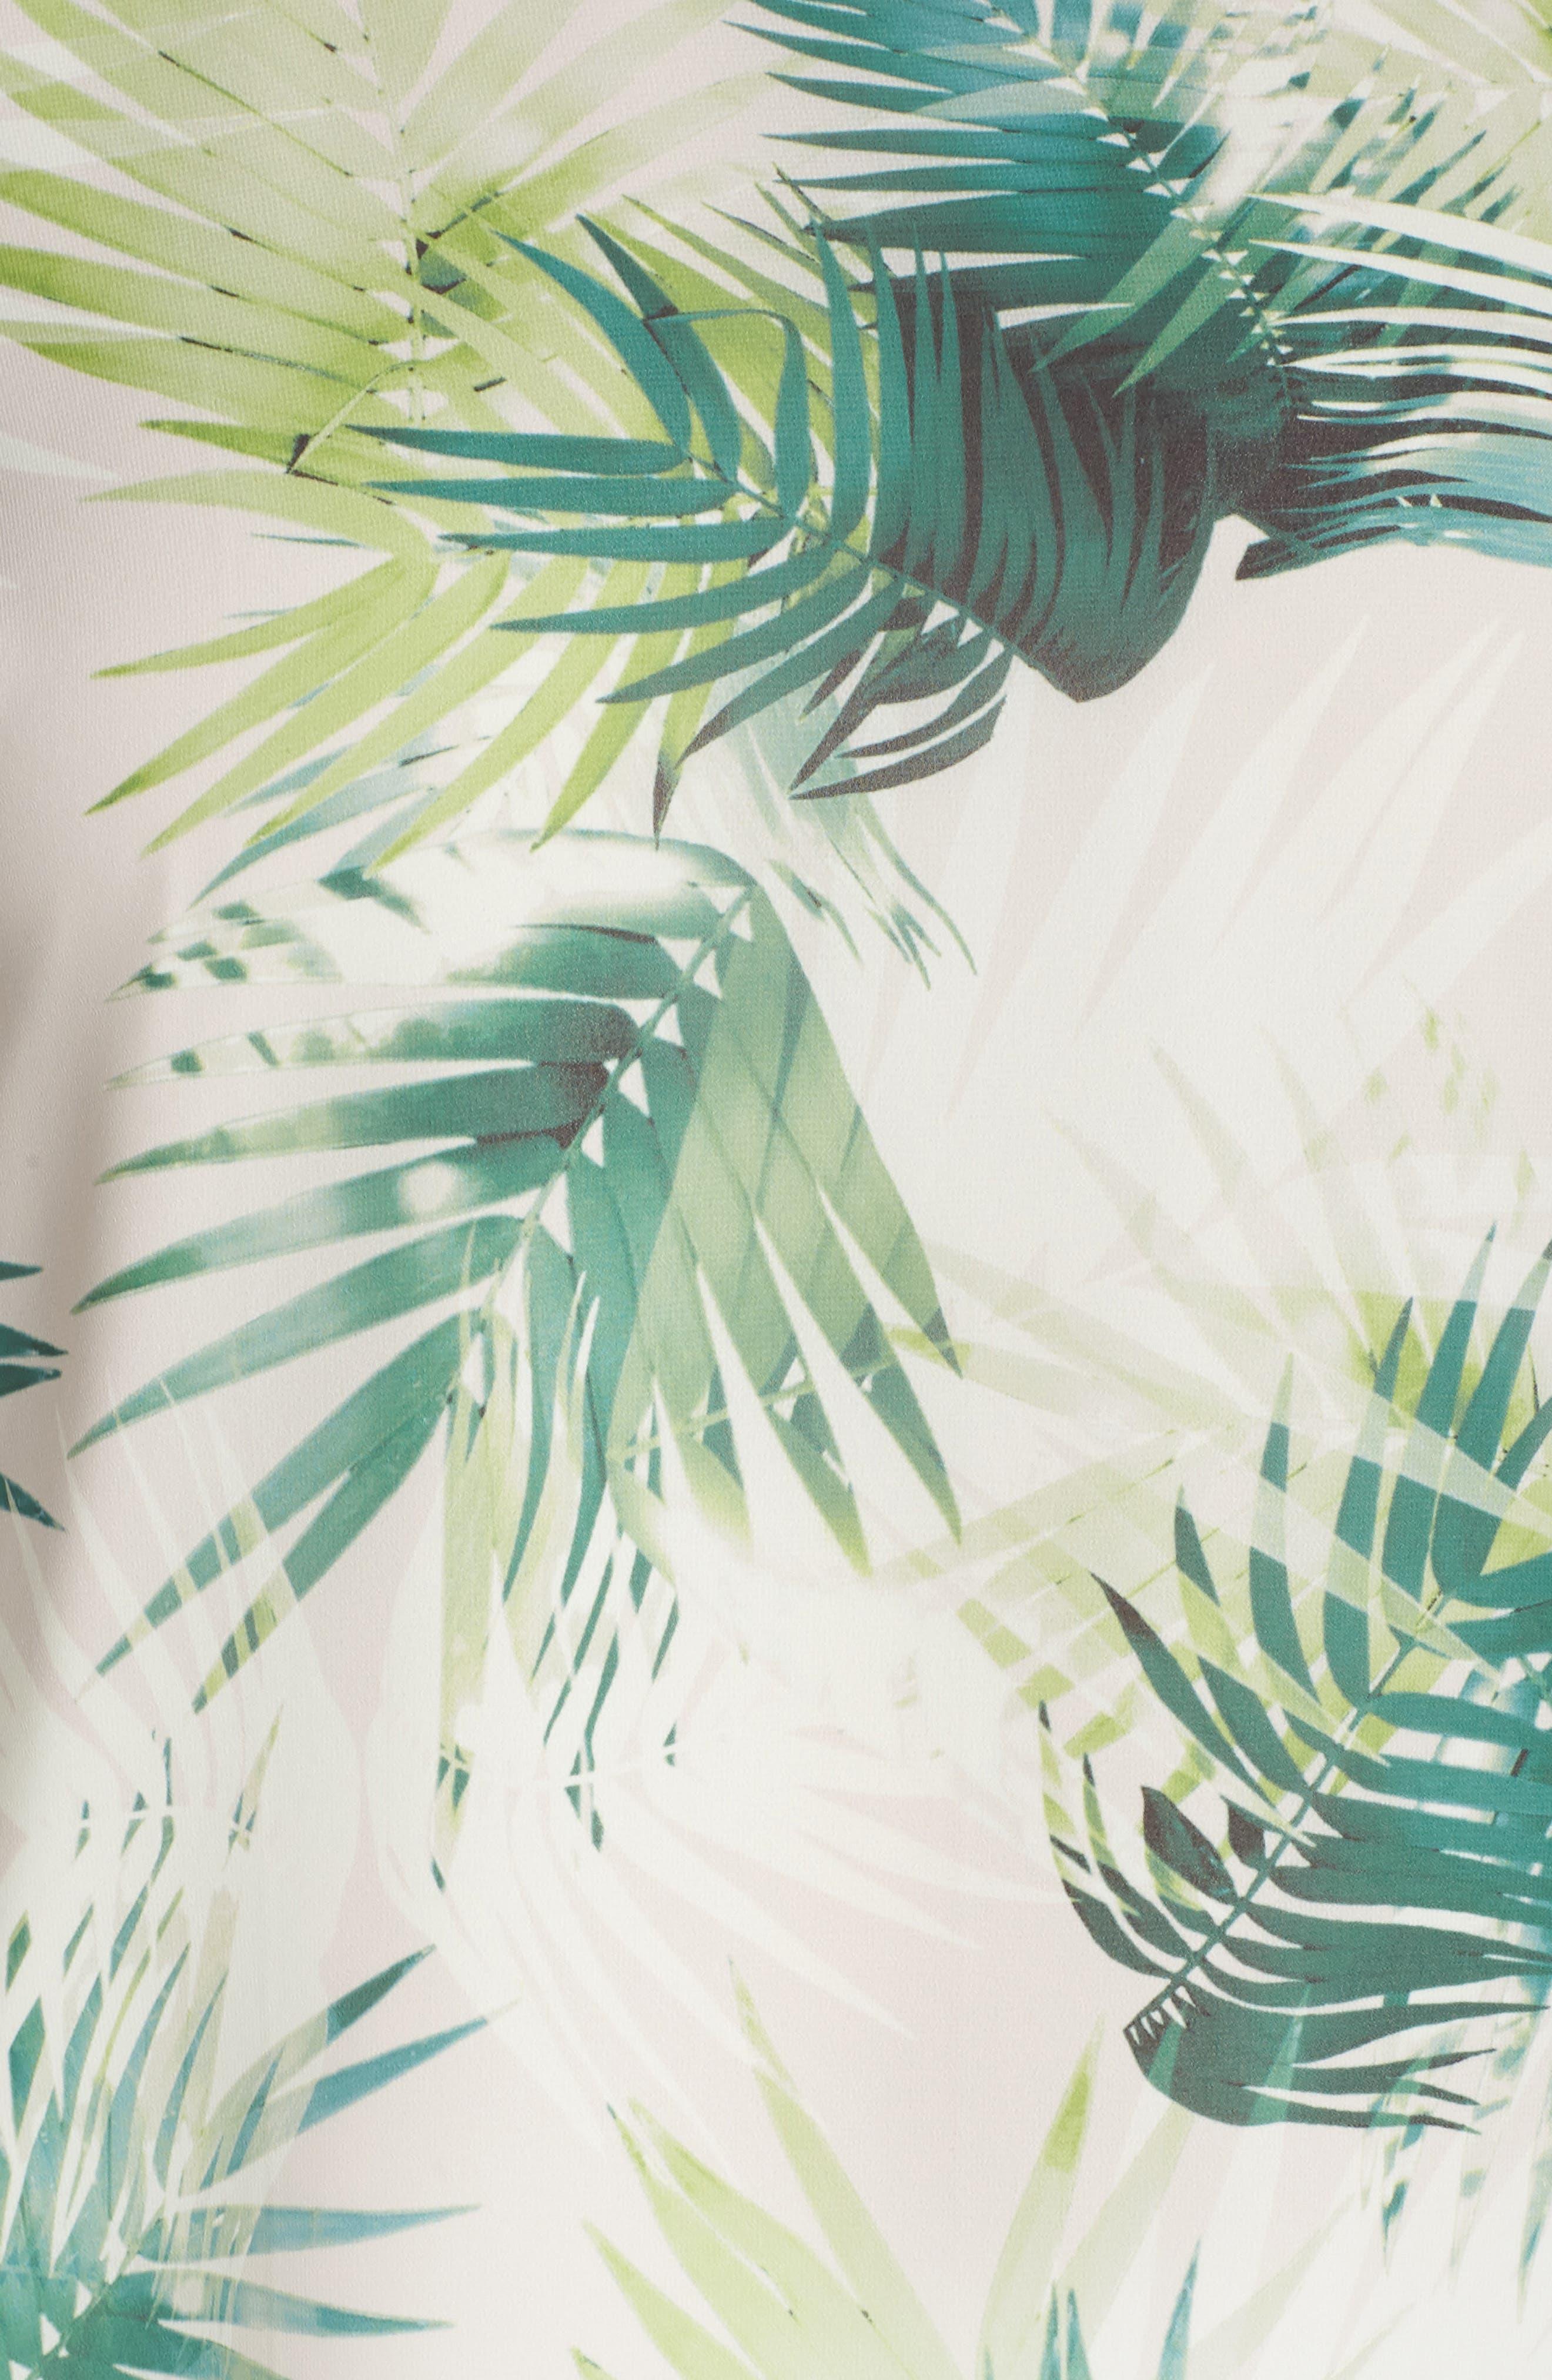 Drawstring Sleeve Sunlit Palm Print Top,                             Alternate thumbnail 6, color,                             336